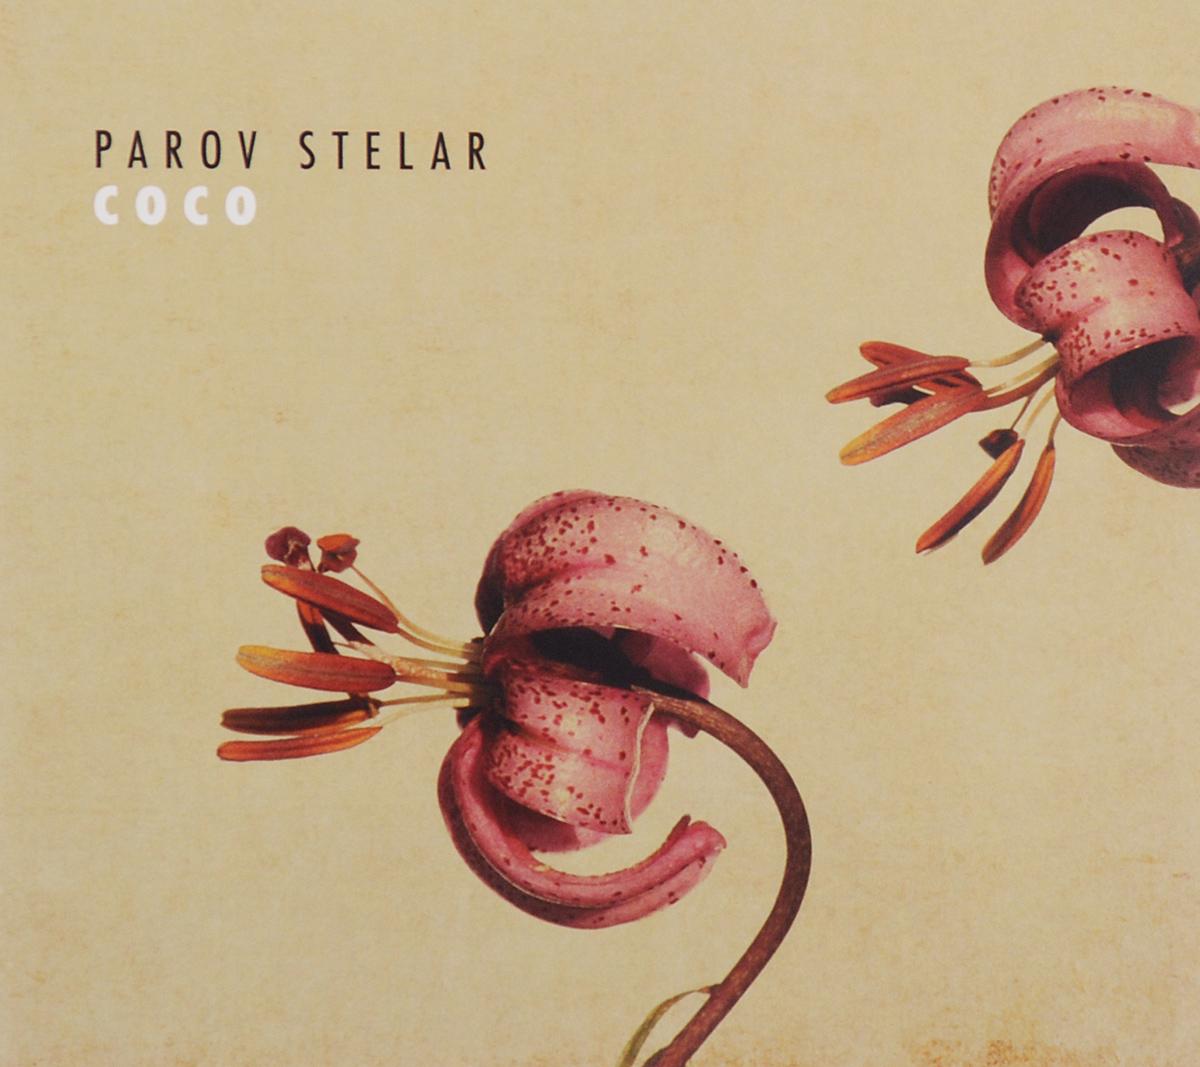 Parov Stelar Parov Stelar. Coco (2 CD) parov stelar parov stelar the paris swing box 2 lp